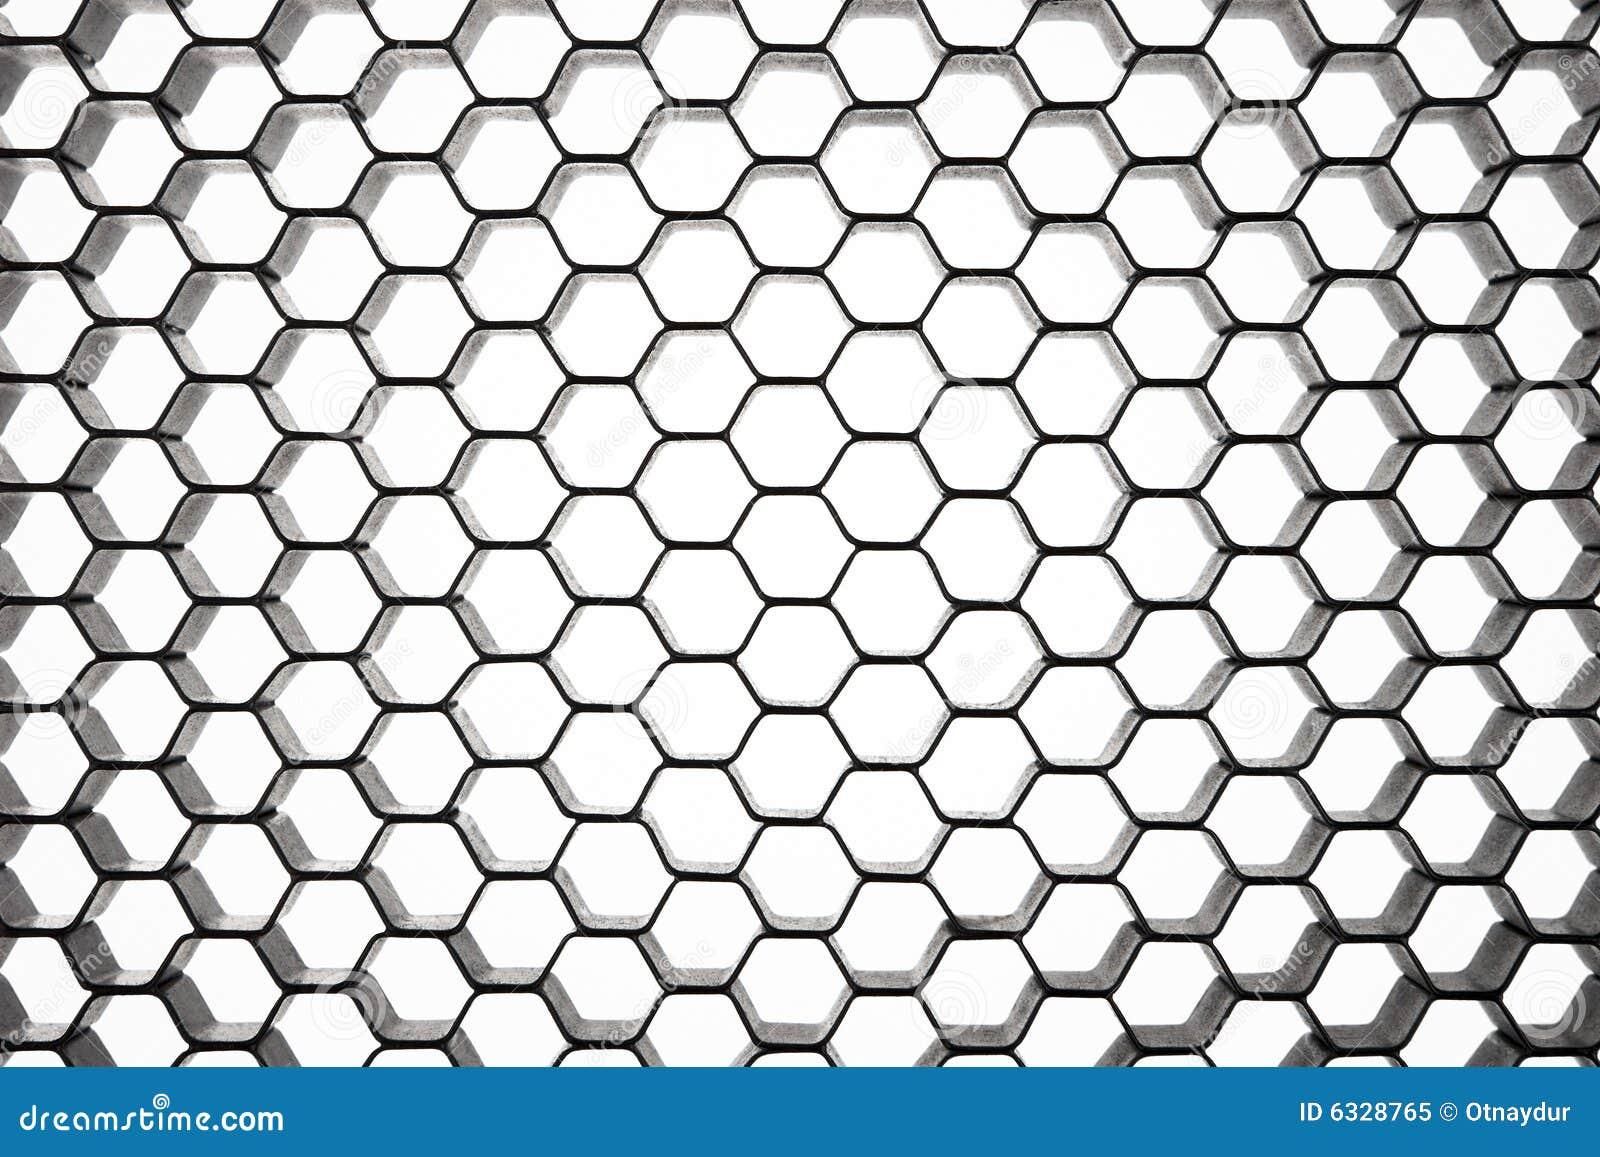 circular pattern beehive royalty free stock photo image